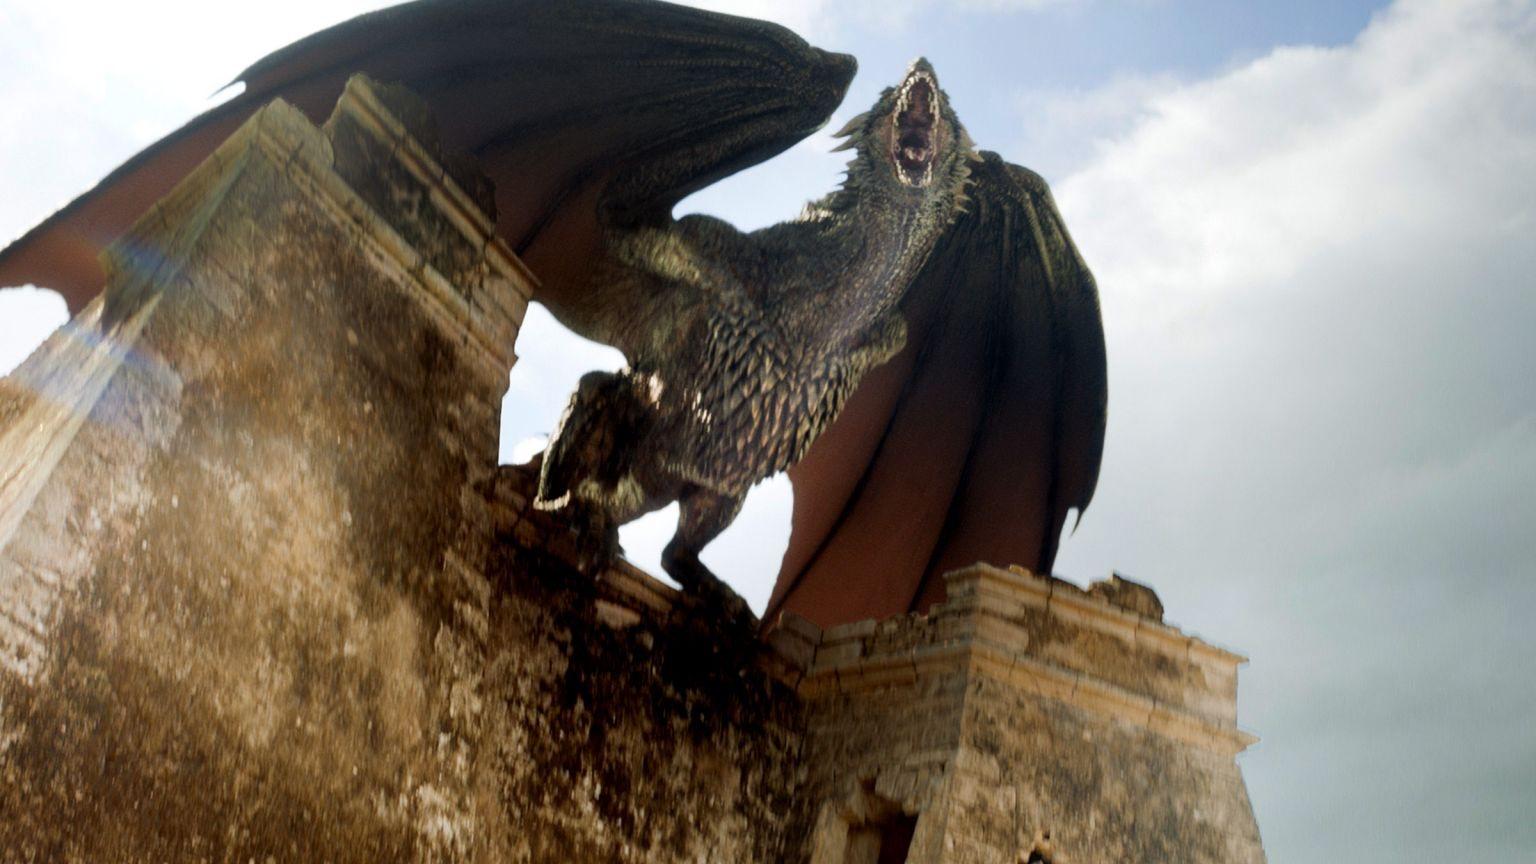 Snow X Bolton - Battle of The Bastards leva Game of Thrones a loucura!